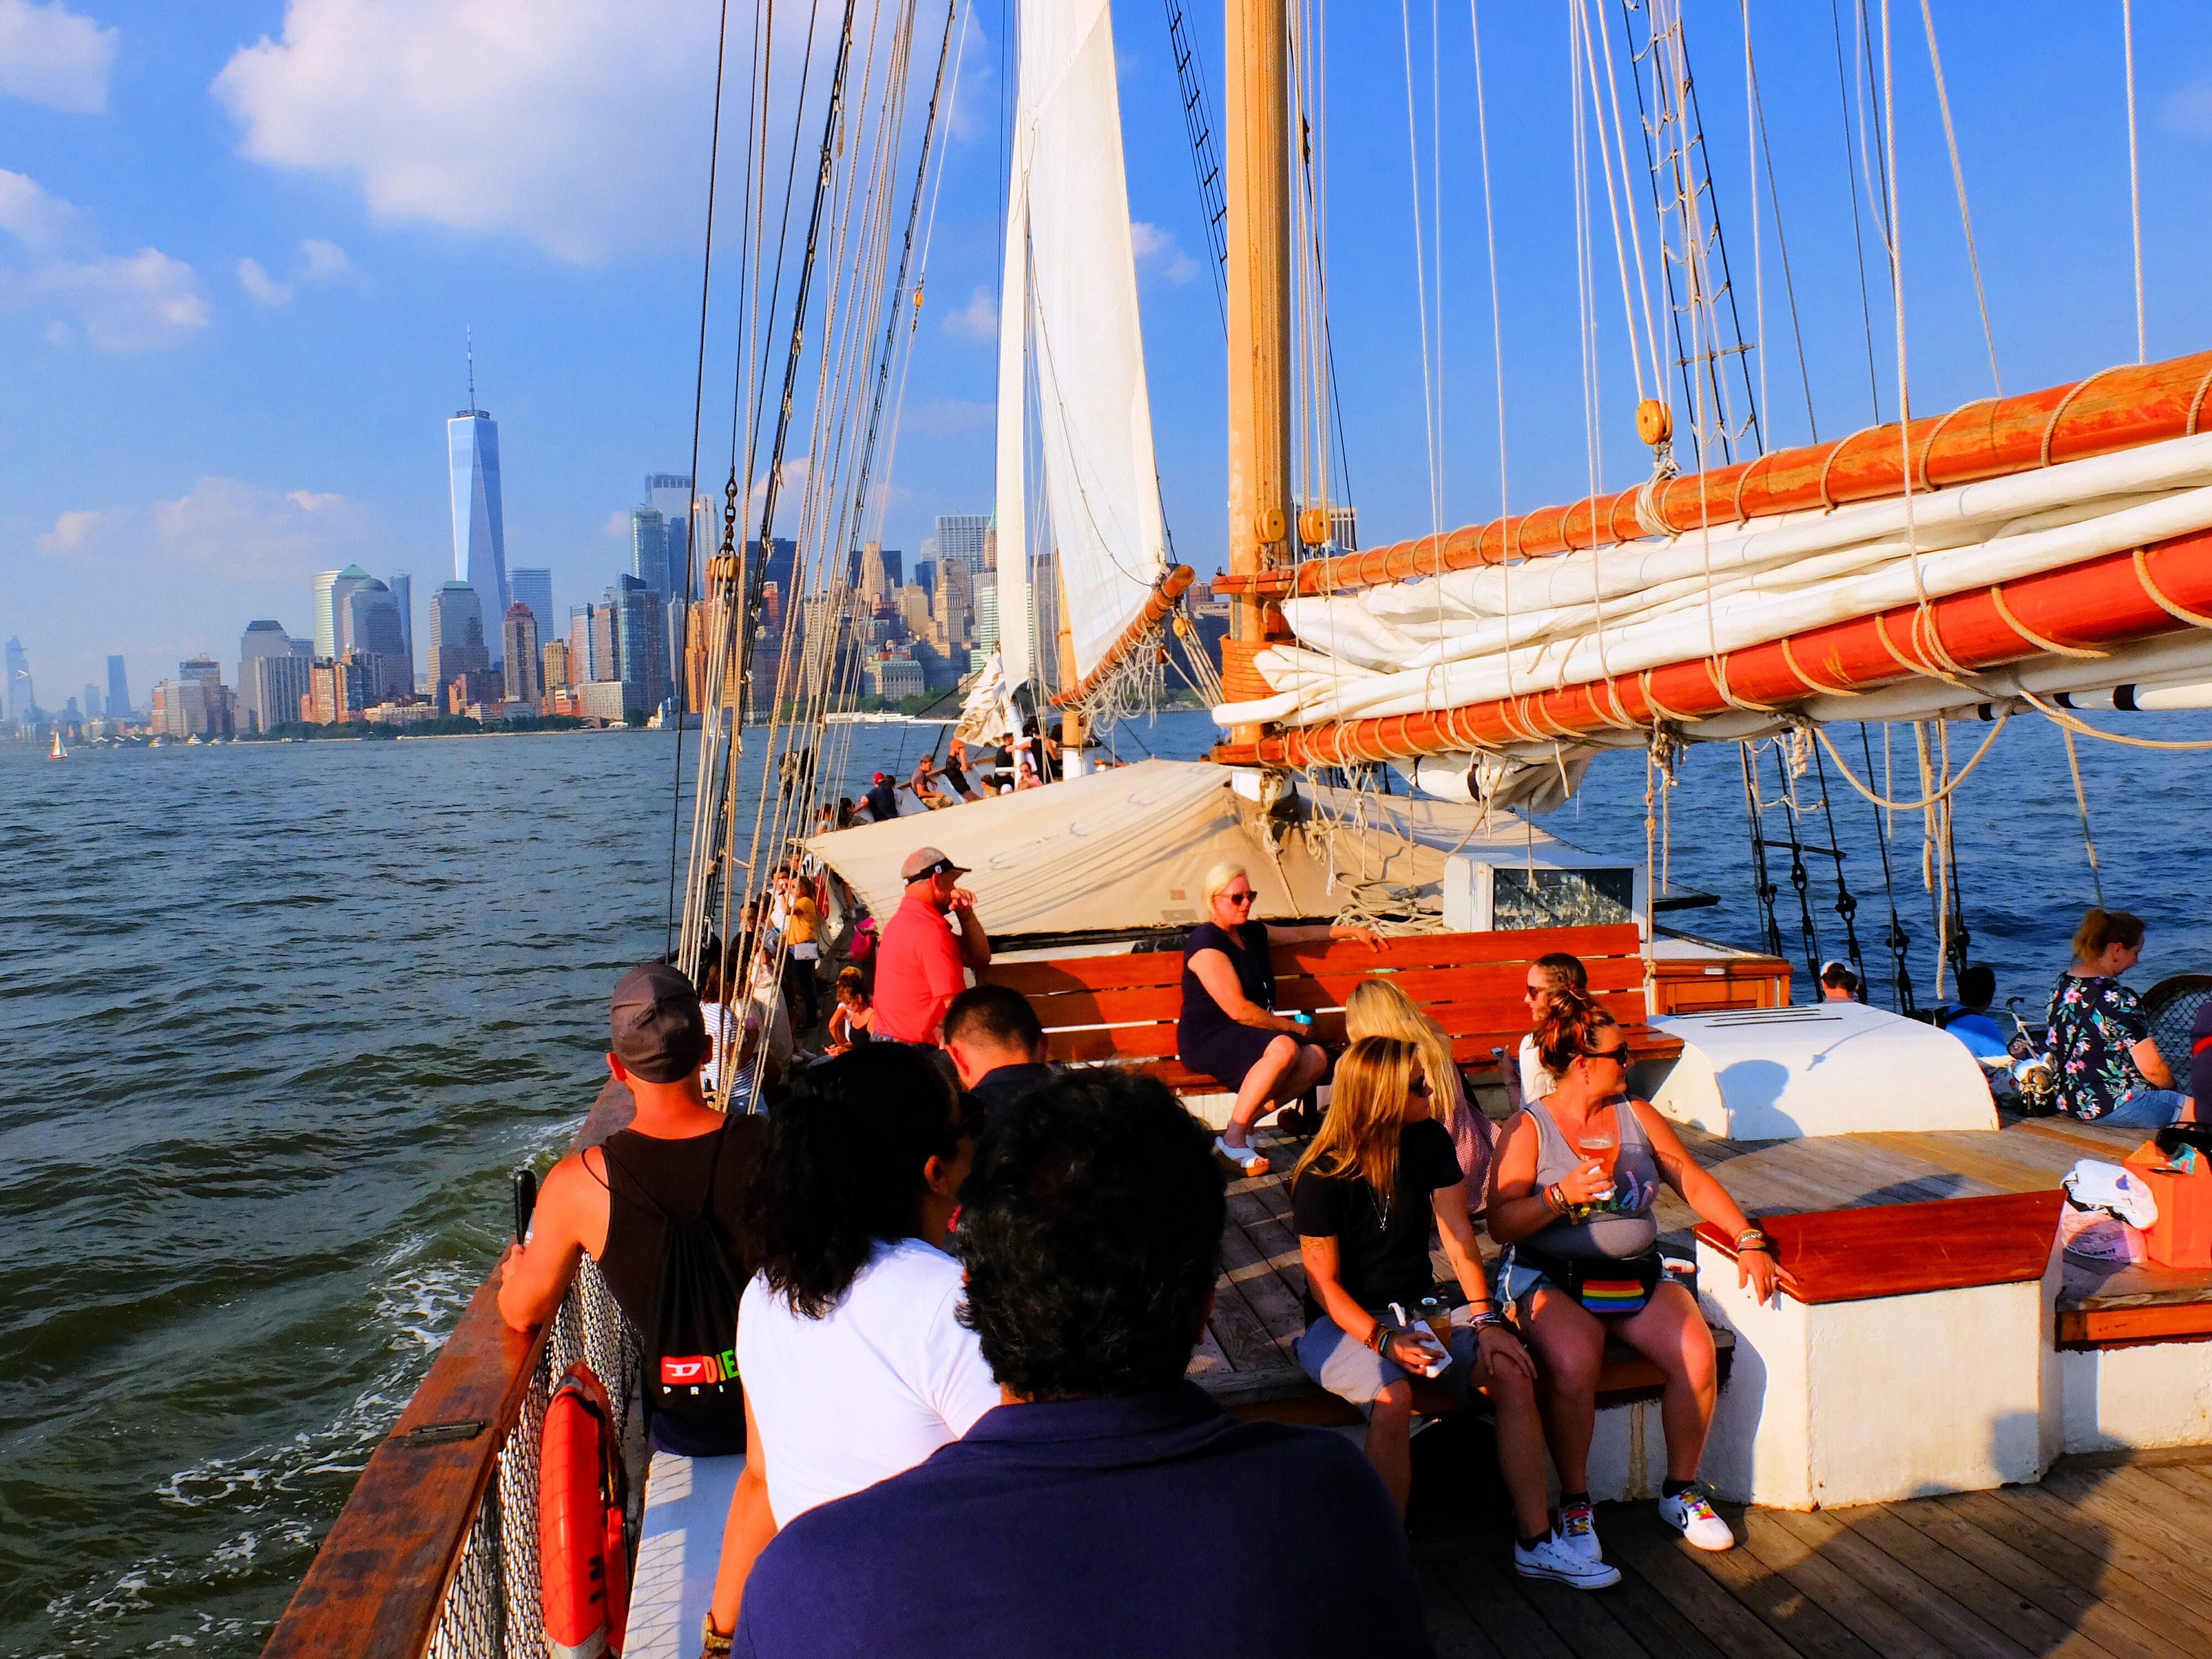 Sailboat New York City High Quality Wallpaper